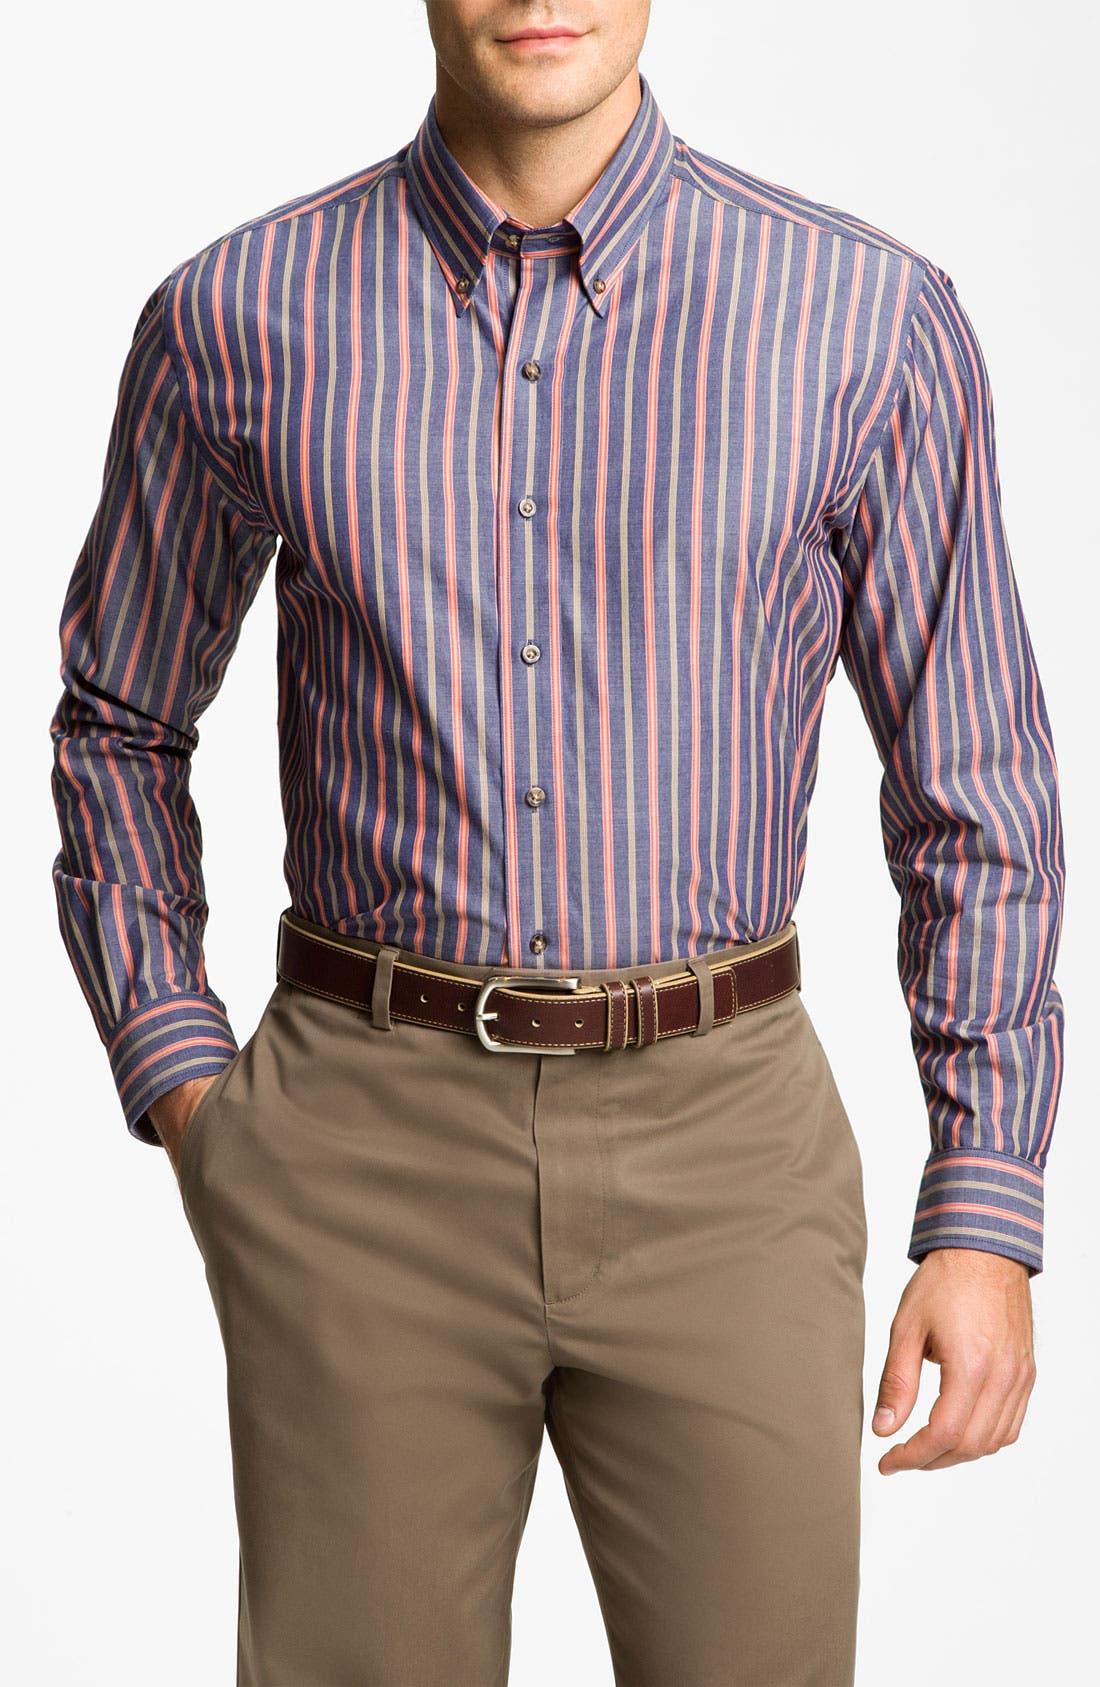 Alternate Image 1 Selected - Cutter & Buck 'Harvest' Stripe Sport Shirt (Big & Tall) (Online Only)